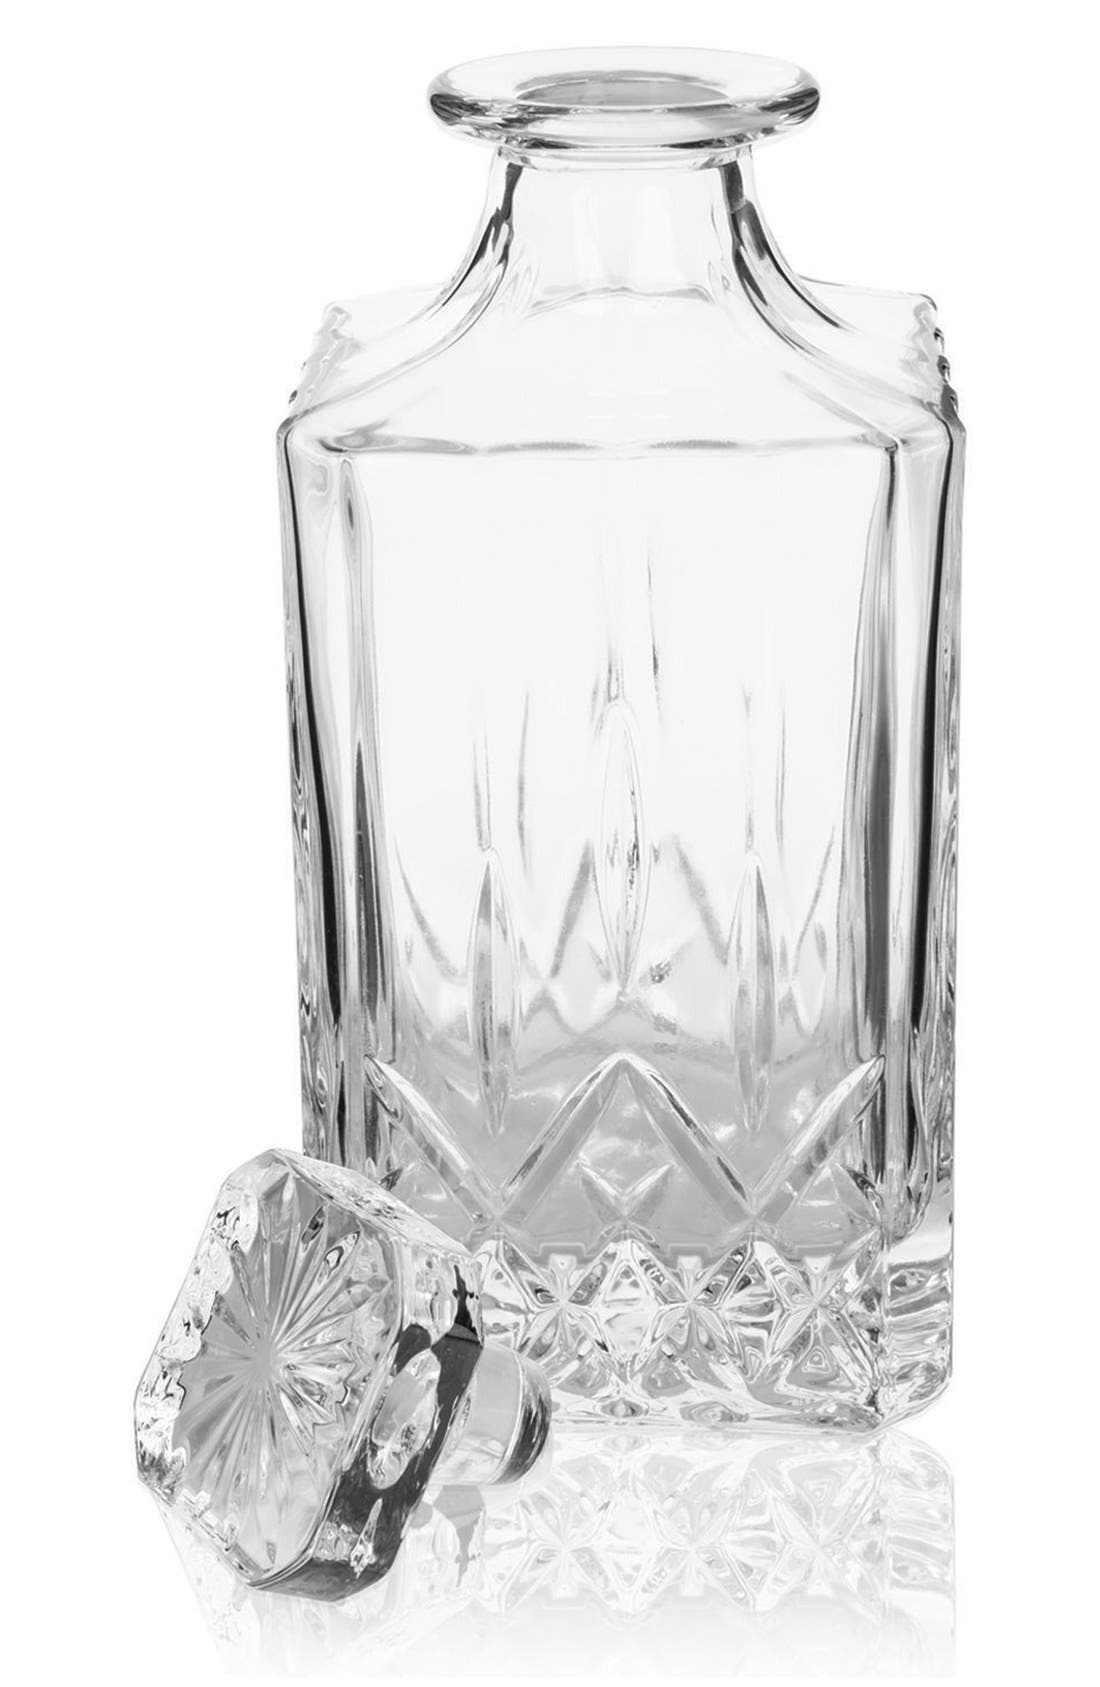 Main Image - Viski by True Fabrications Glass Wine Decanter